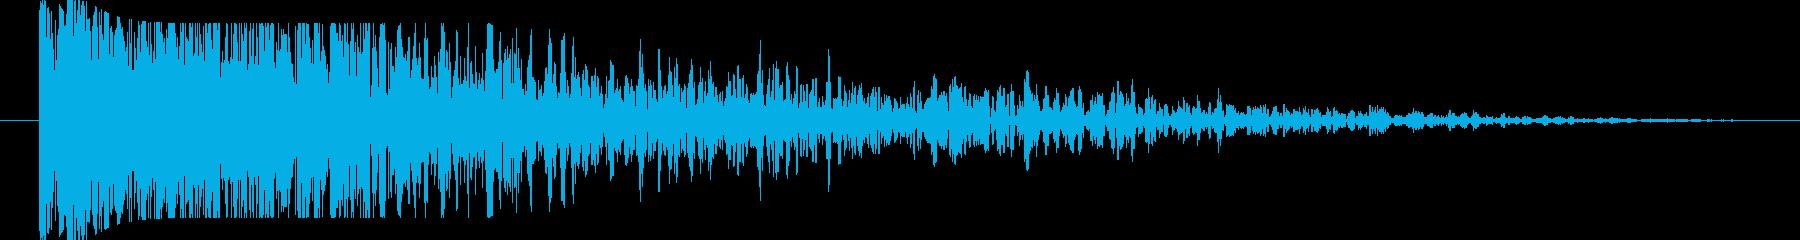 FX 大爆発06の再生済みの波形